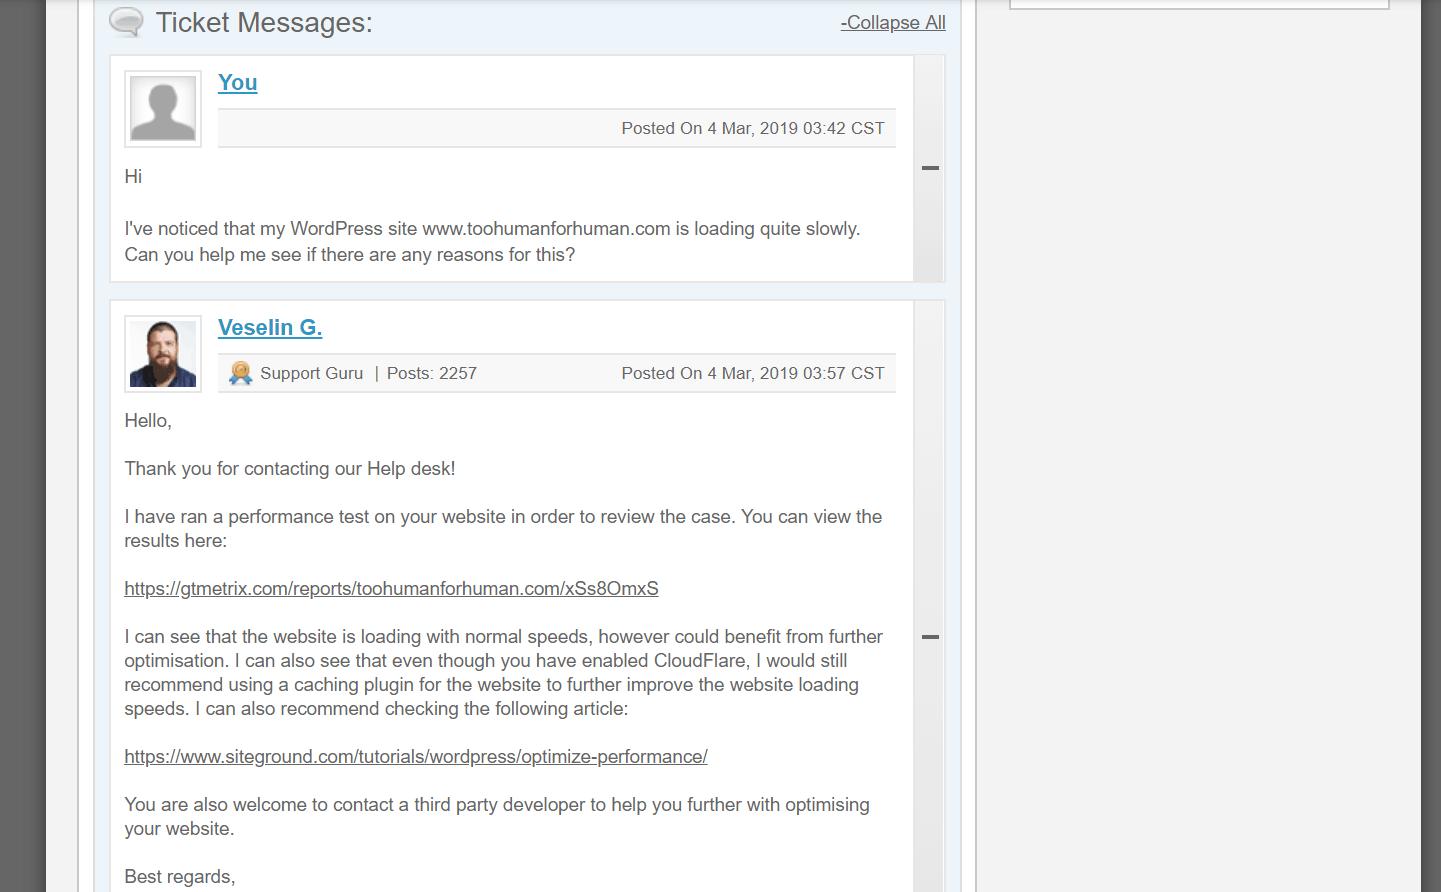 screenshot assistenza via email con siteground